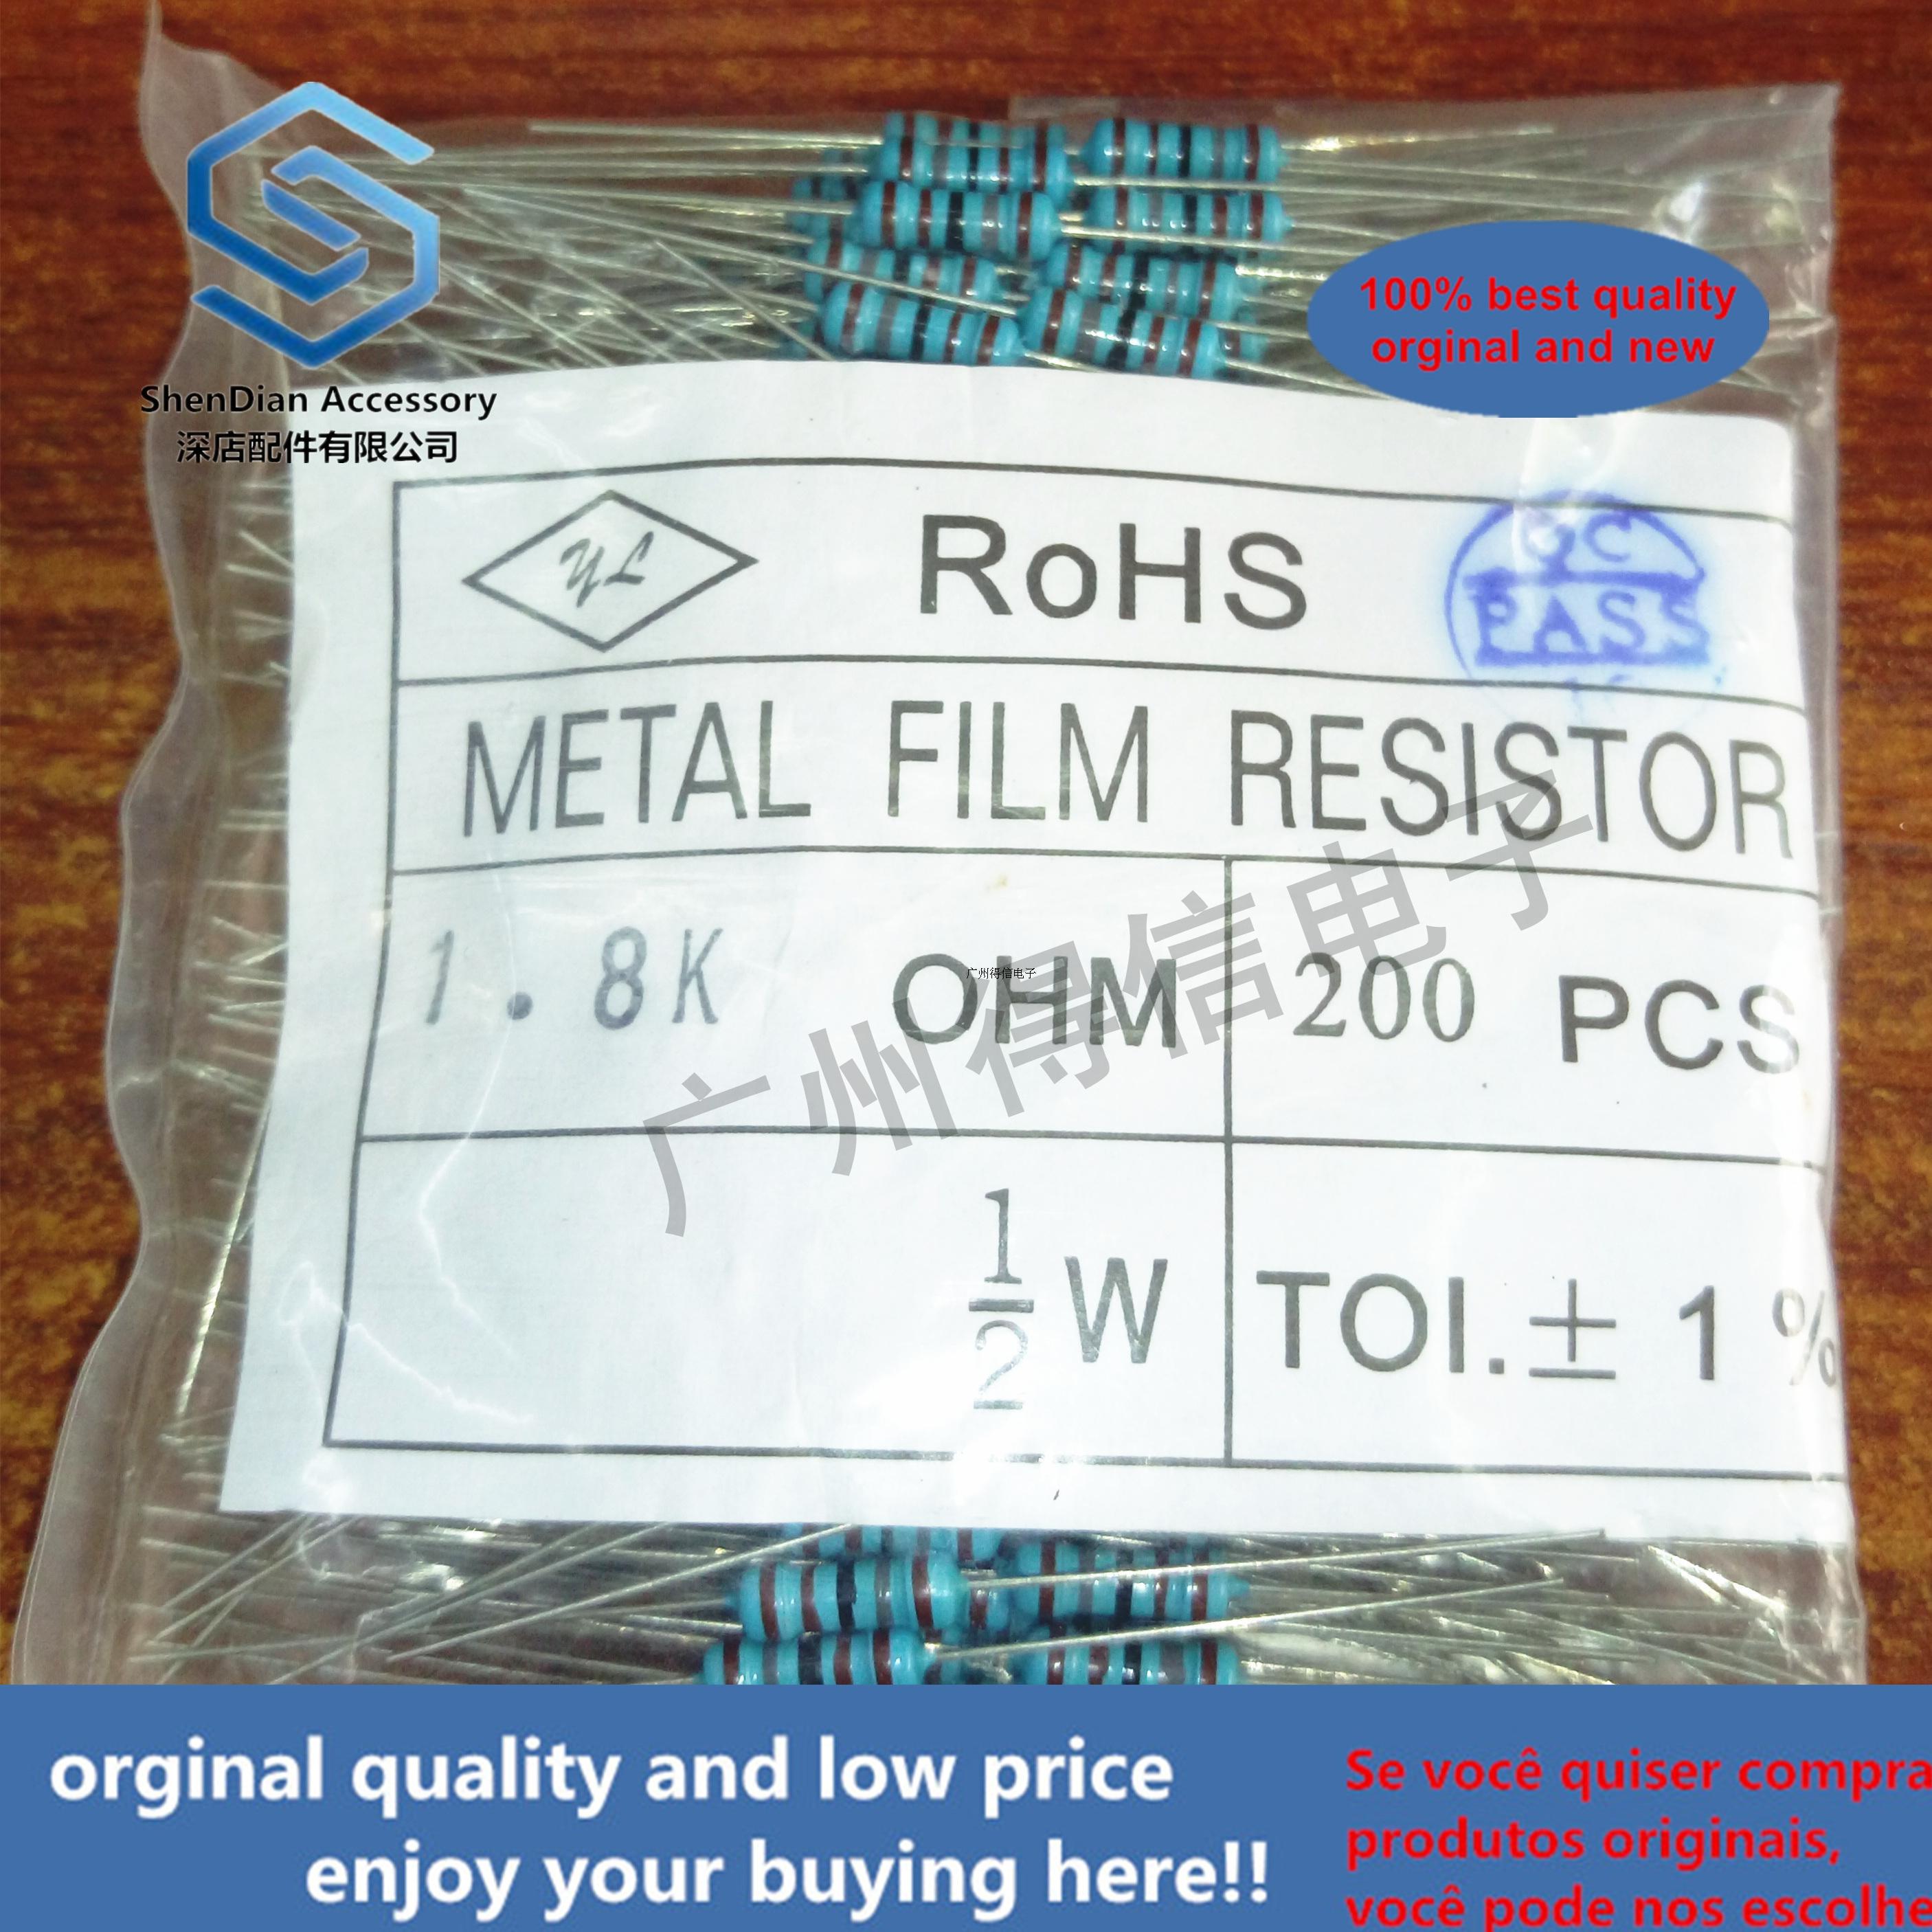 200pcs 1 / 2W 110R 110 Euro 1% Brand New Metal Film Iron Feet Resistor Bag 200 Pcs Per Pack